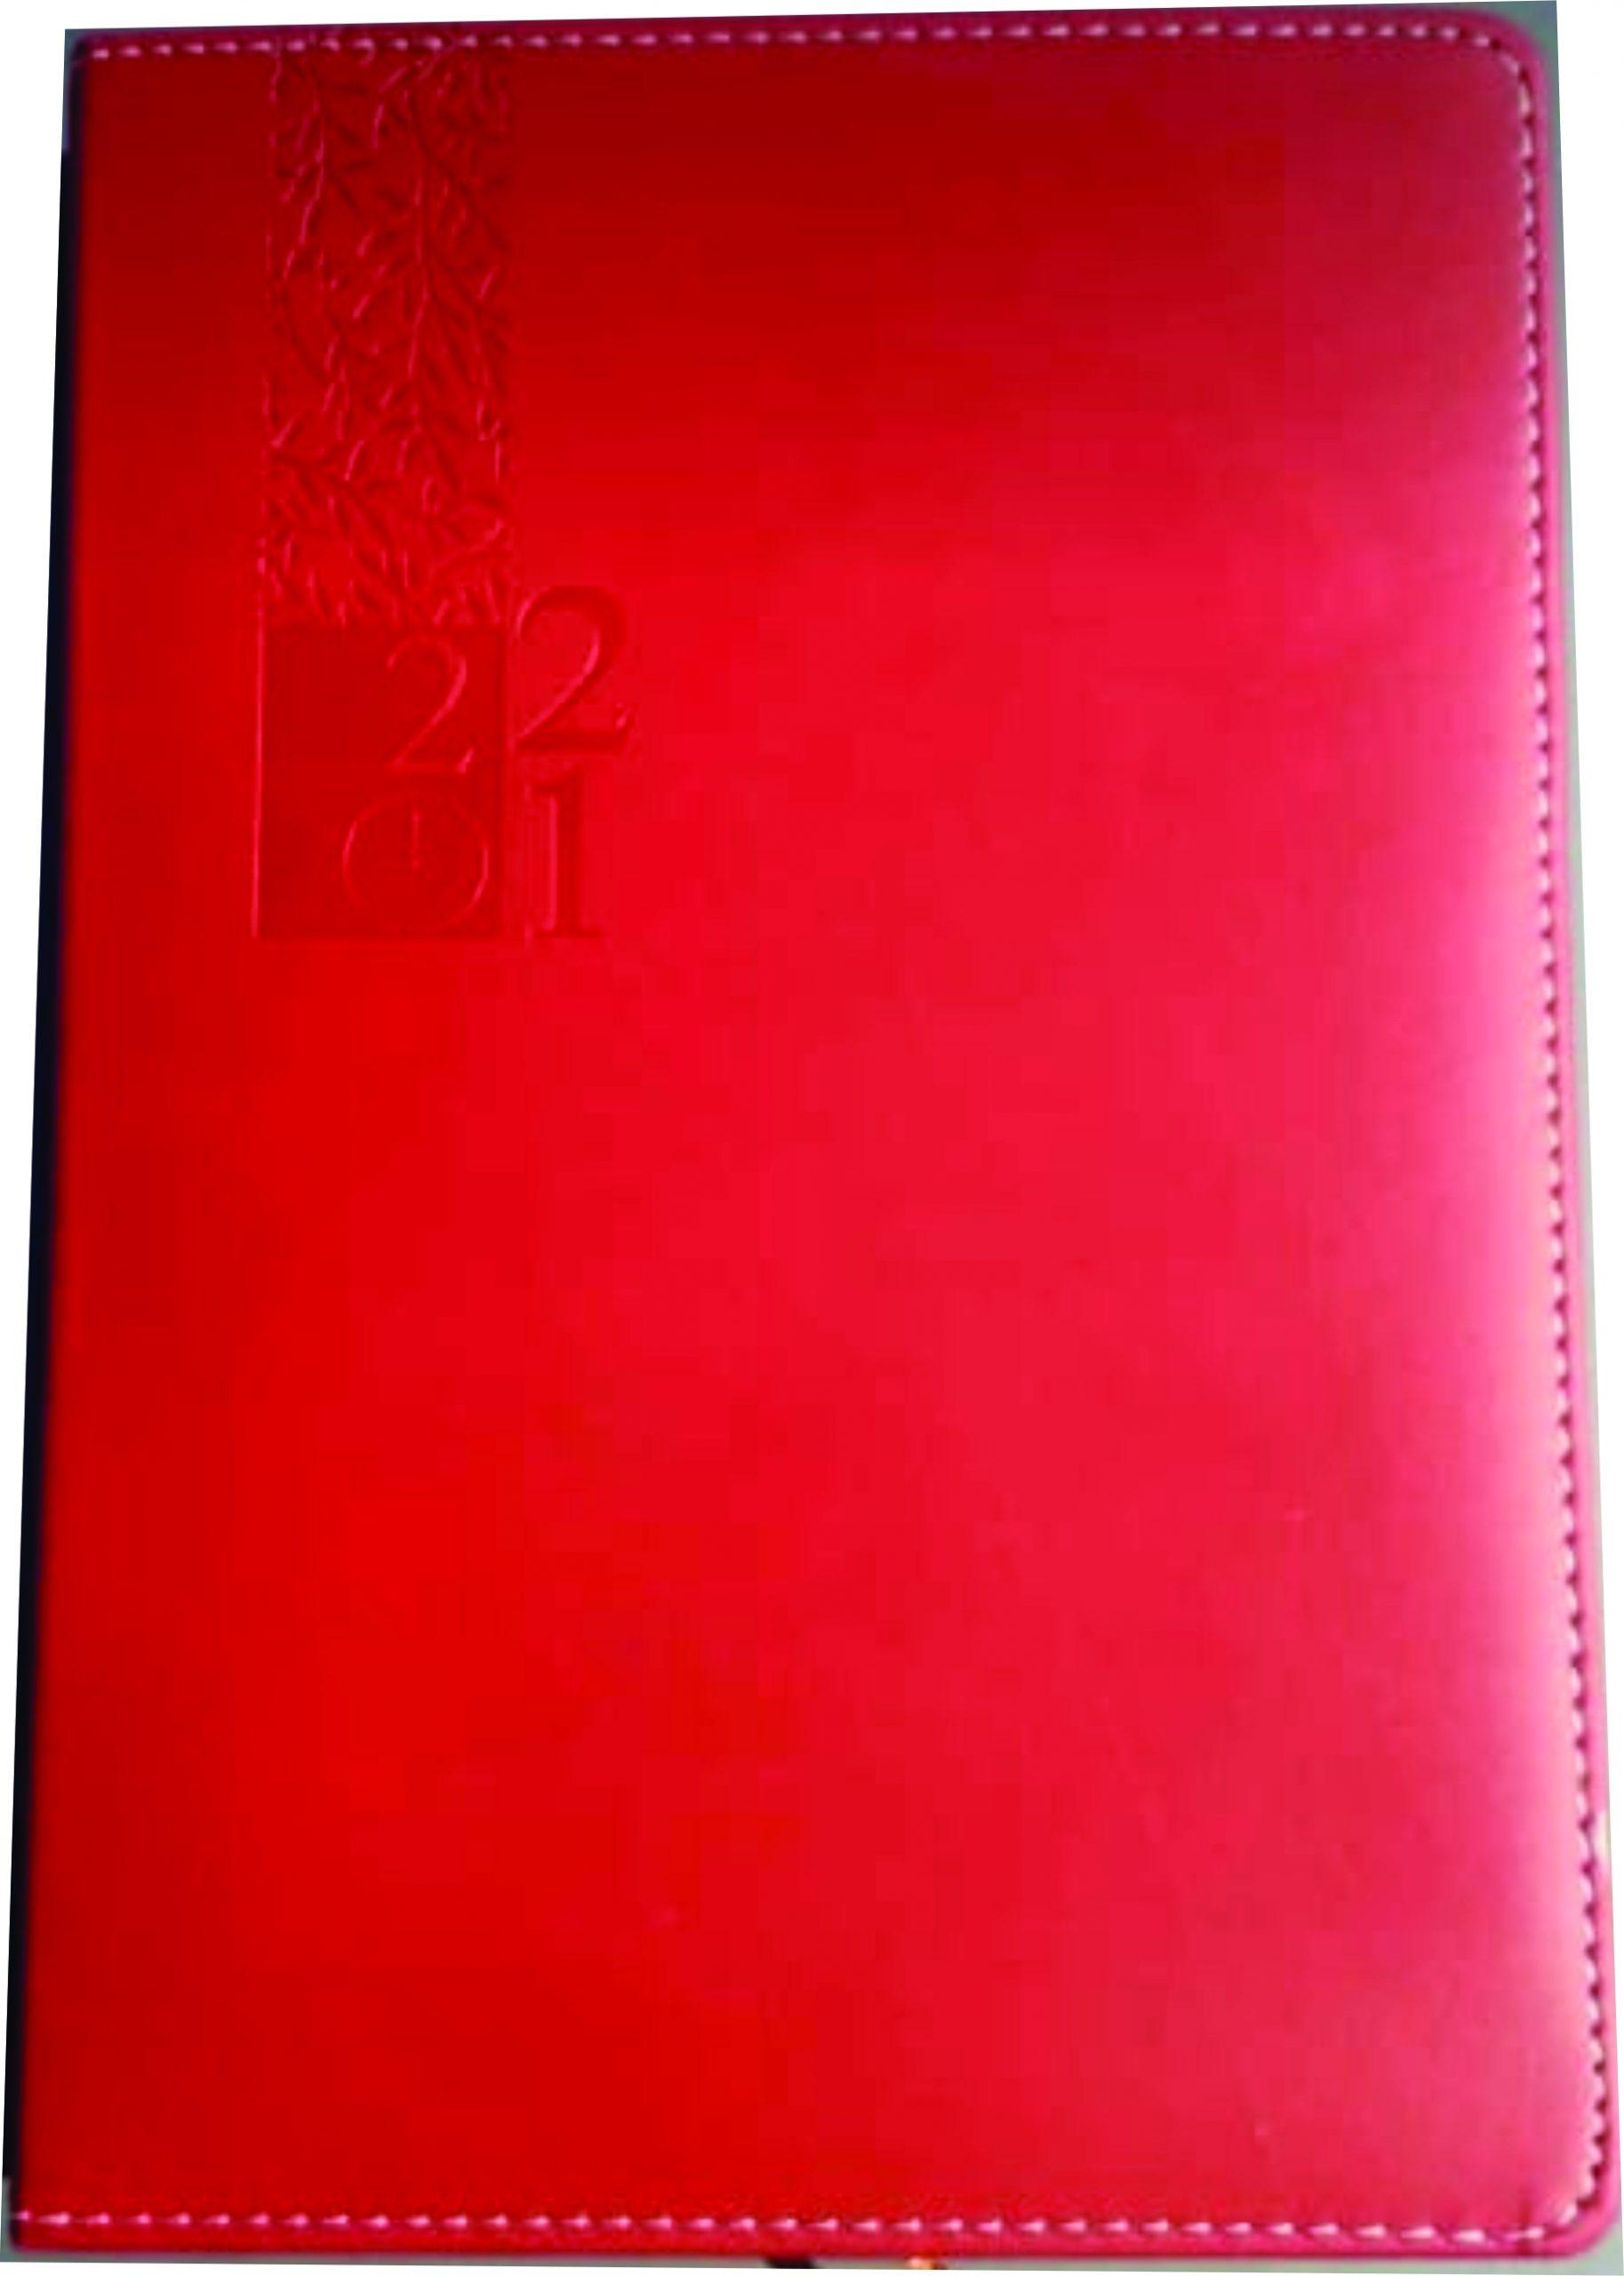 2020 diary branding Johannesburg